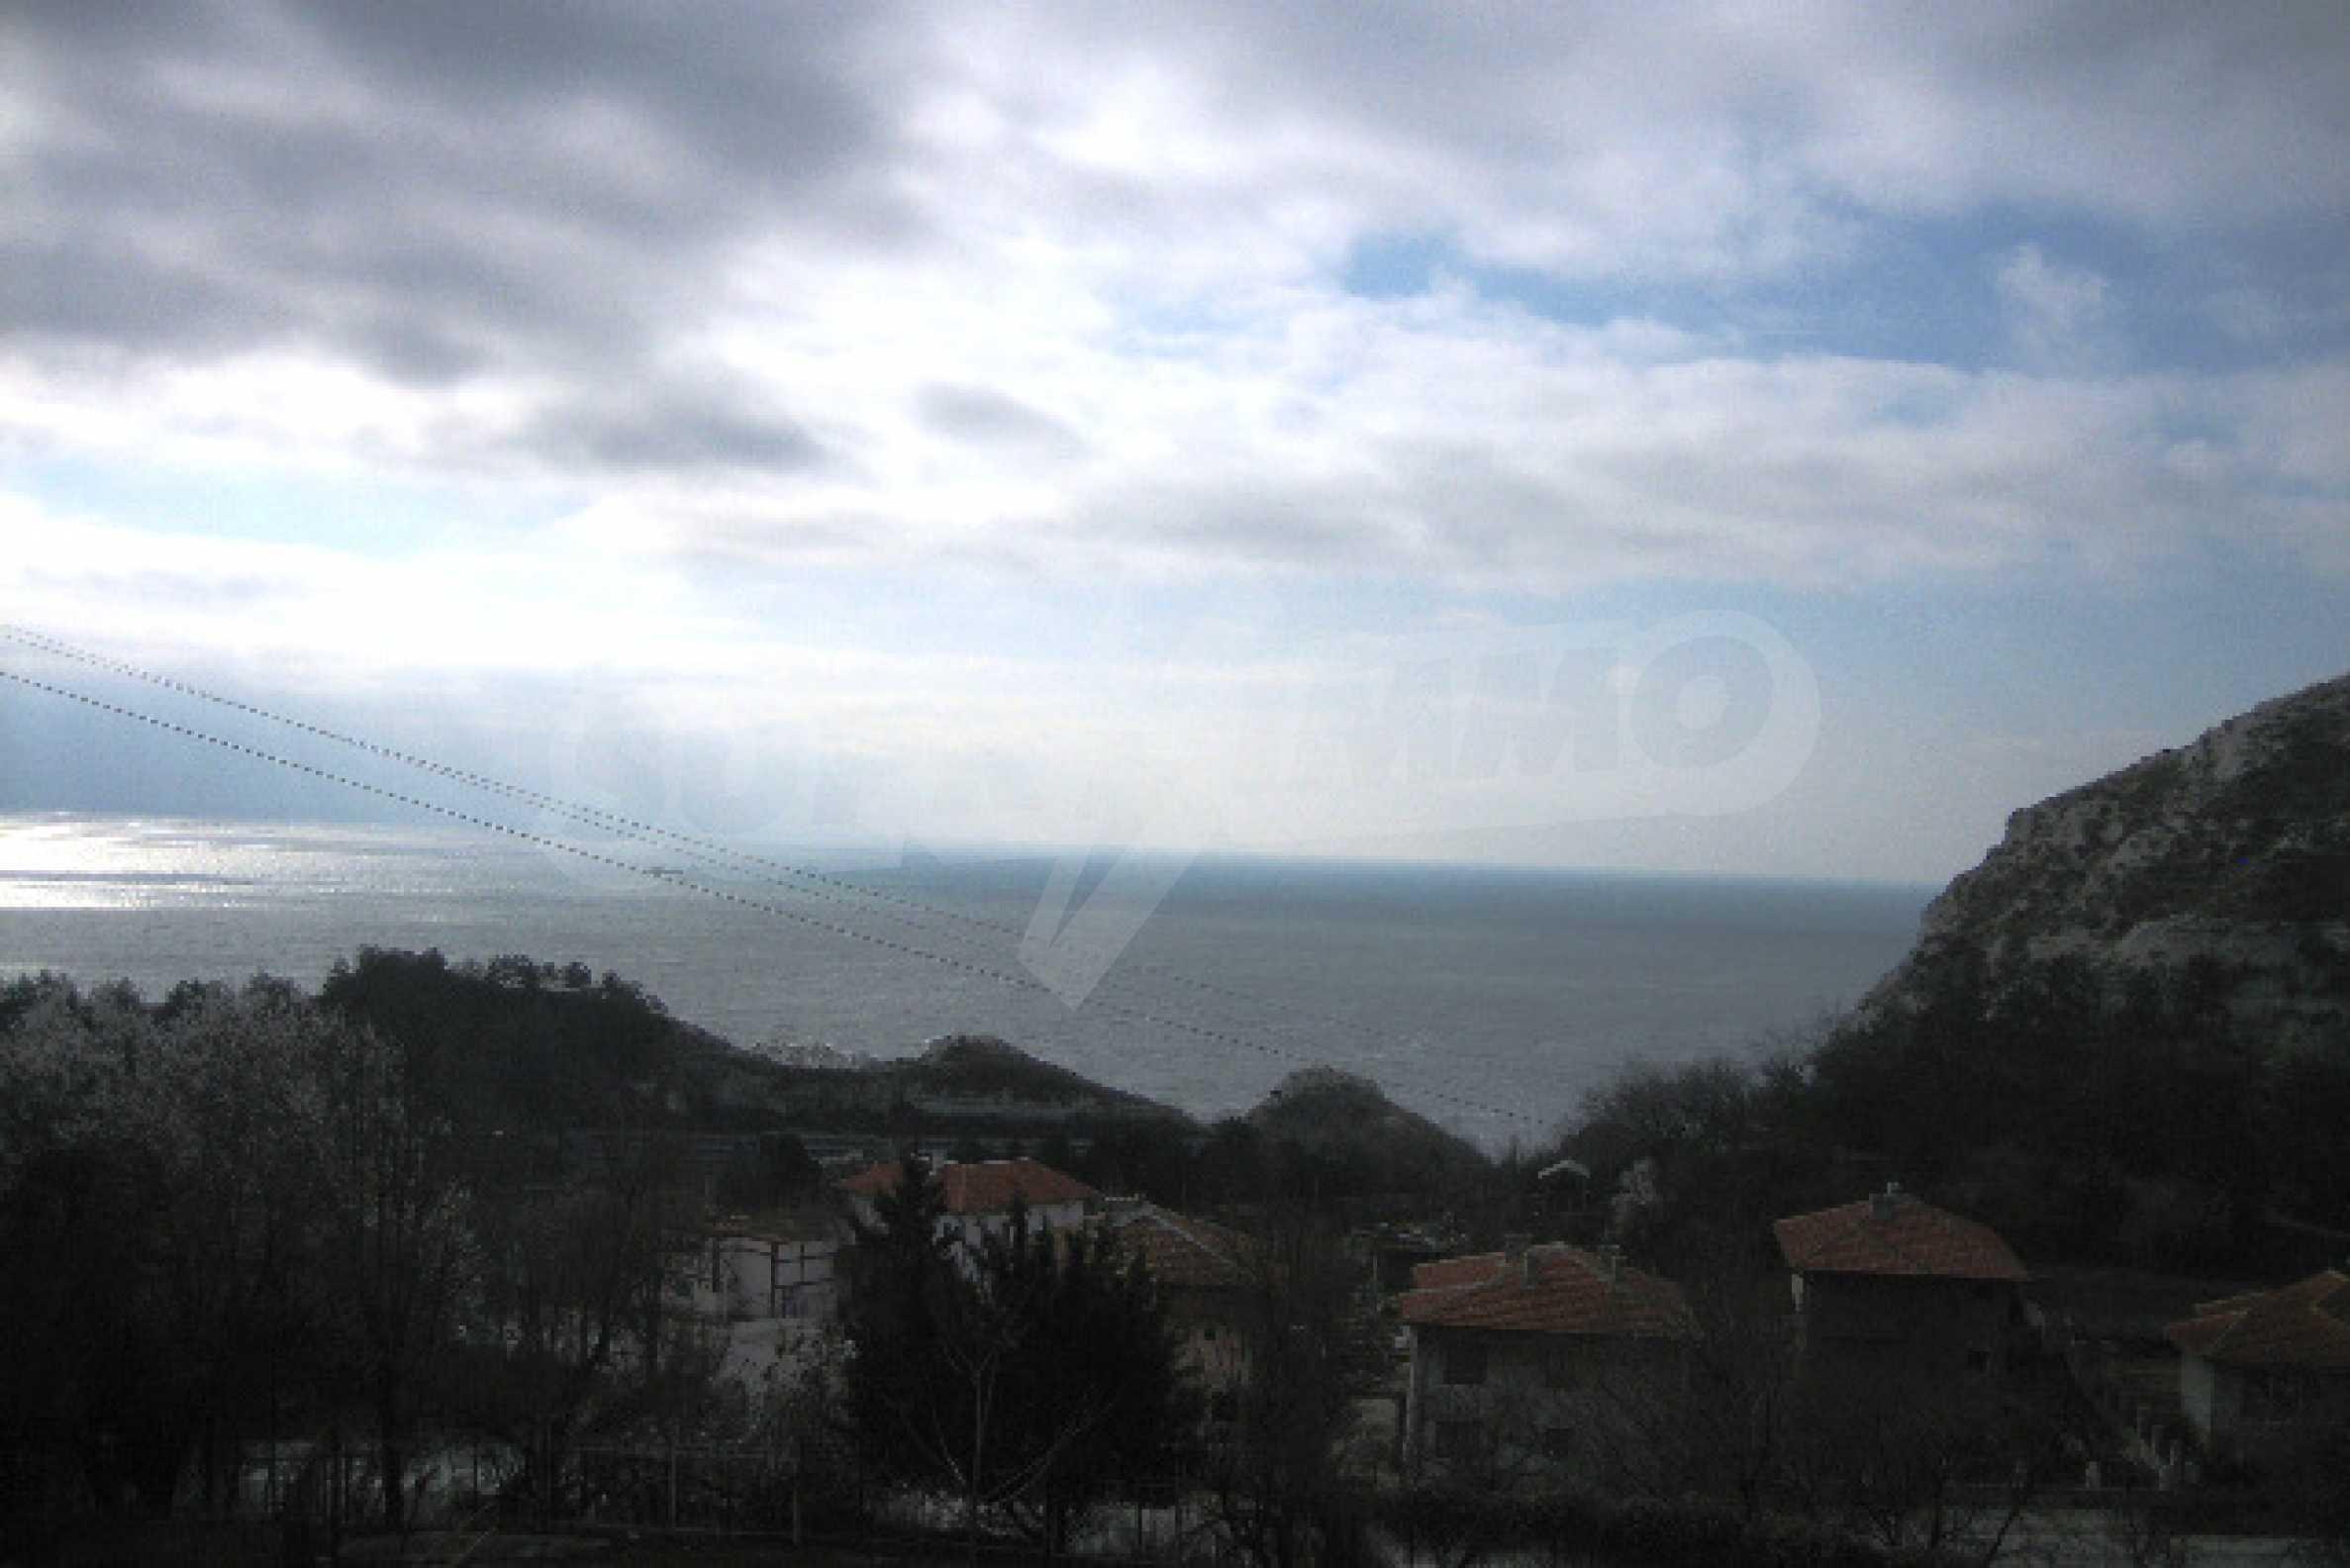 Development land for sale in Balchik